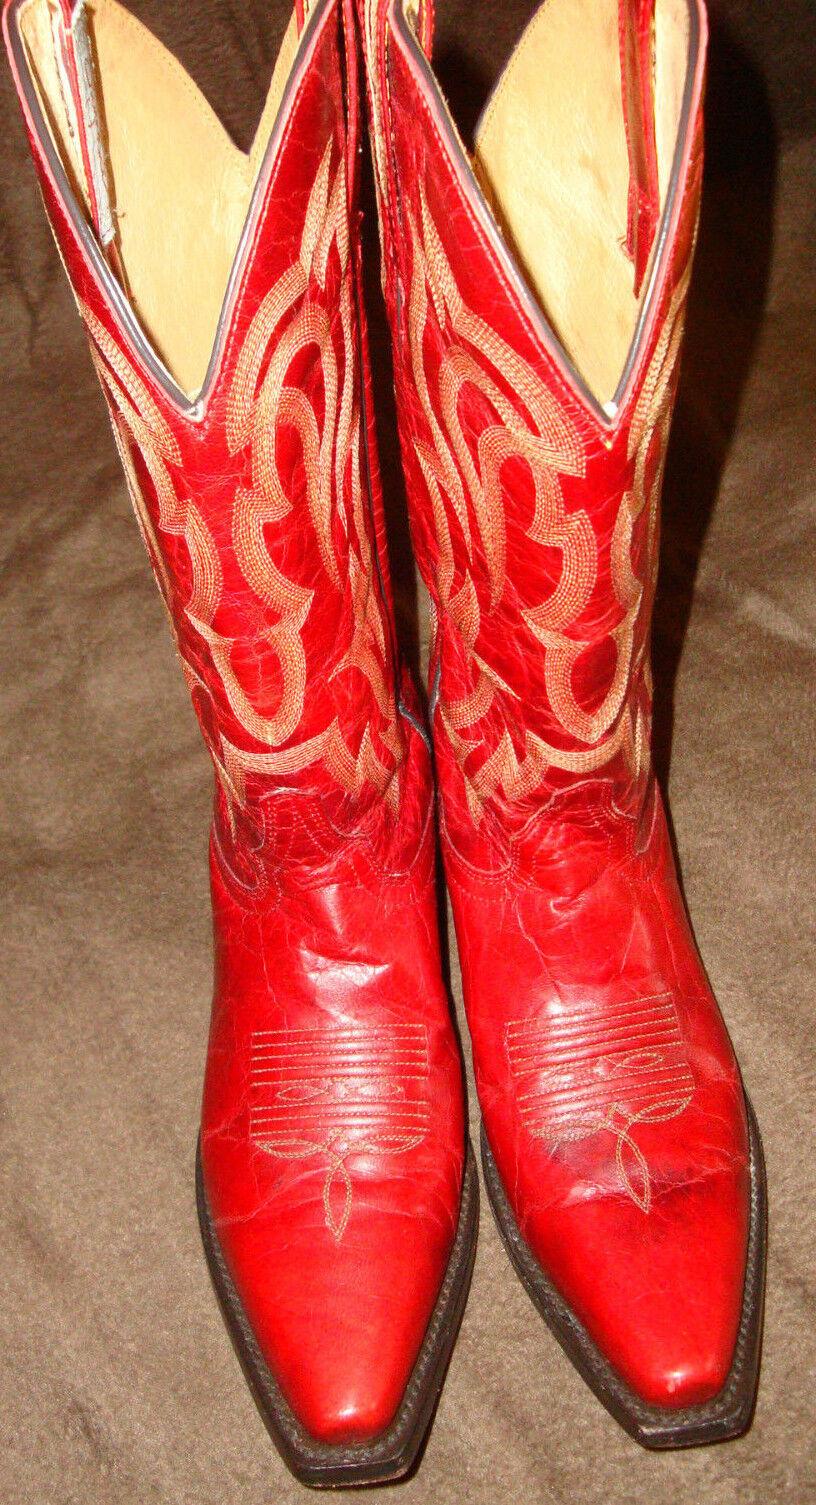 Western - Cowboystiefel USA IBIZA Echtleder rot TREND Muster Gr. 37 neuwertig